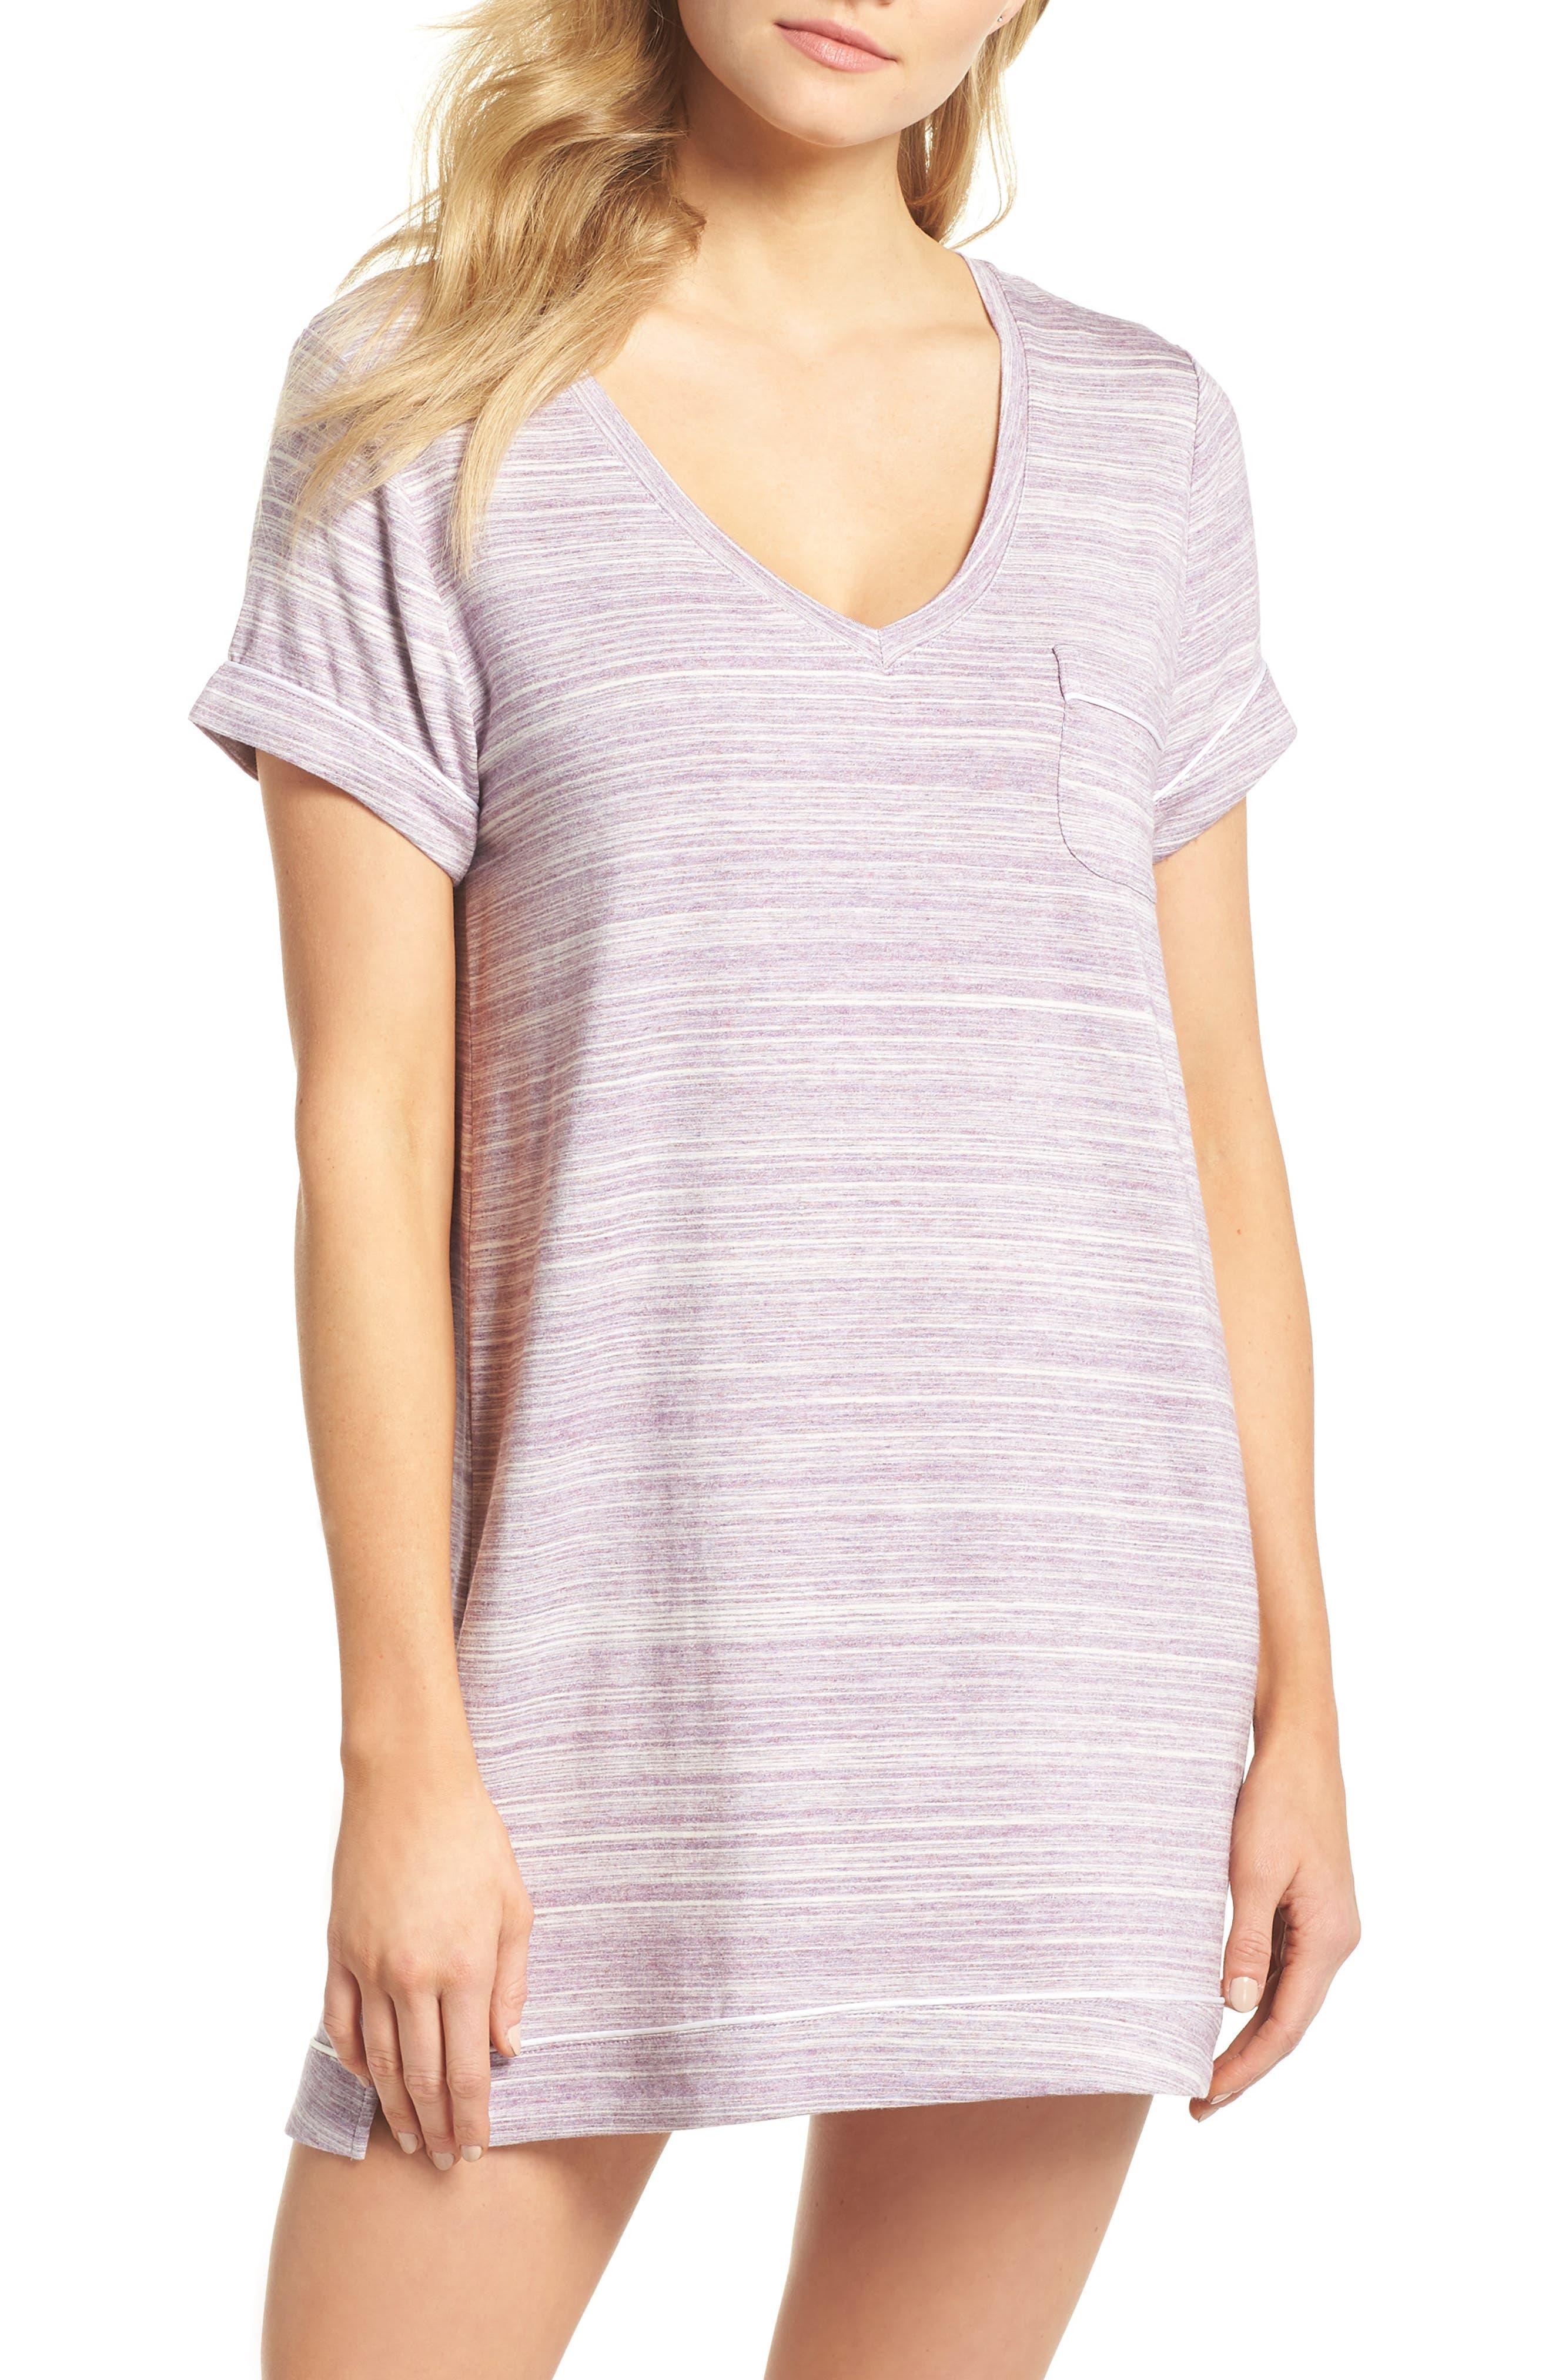 Moonlight Sleep Shirt,                         Main,                         color, Purple Spacedye